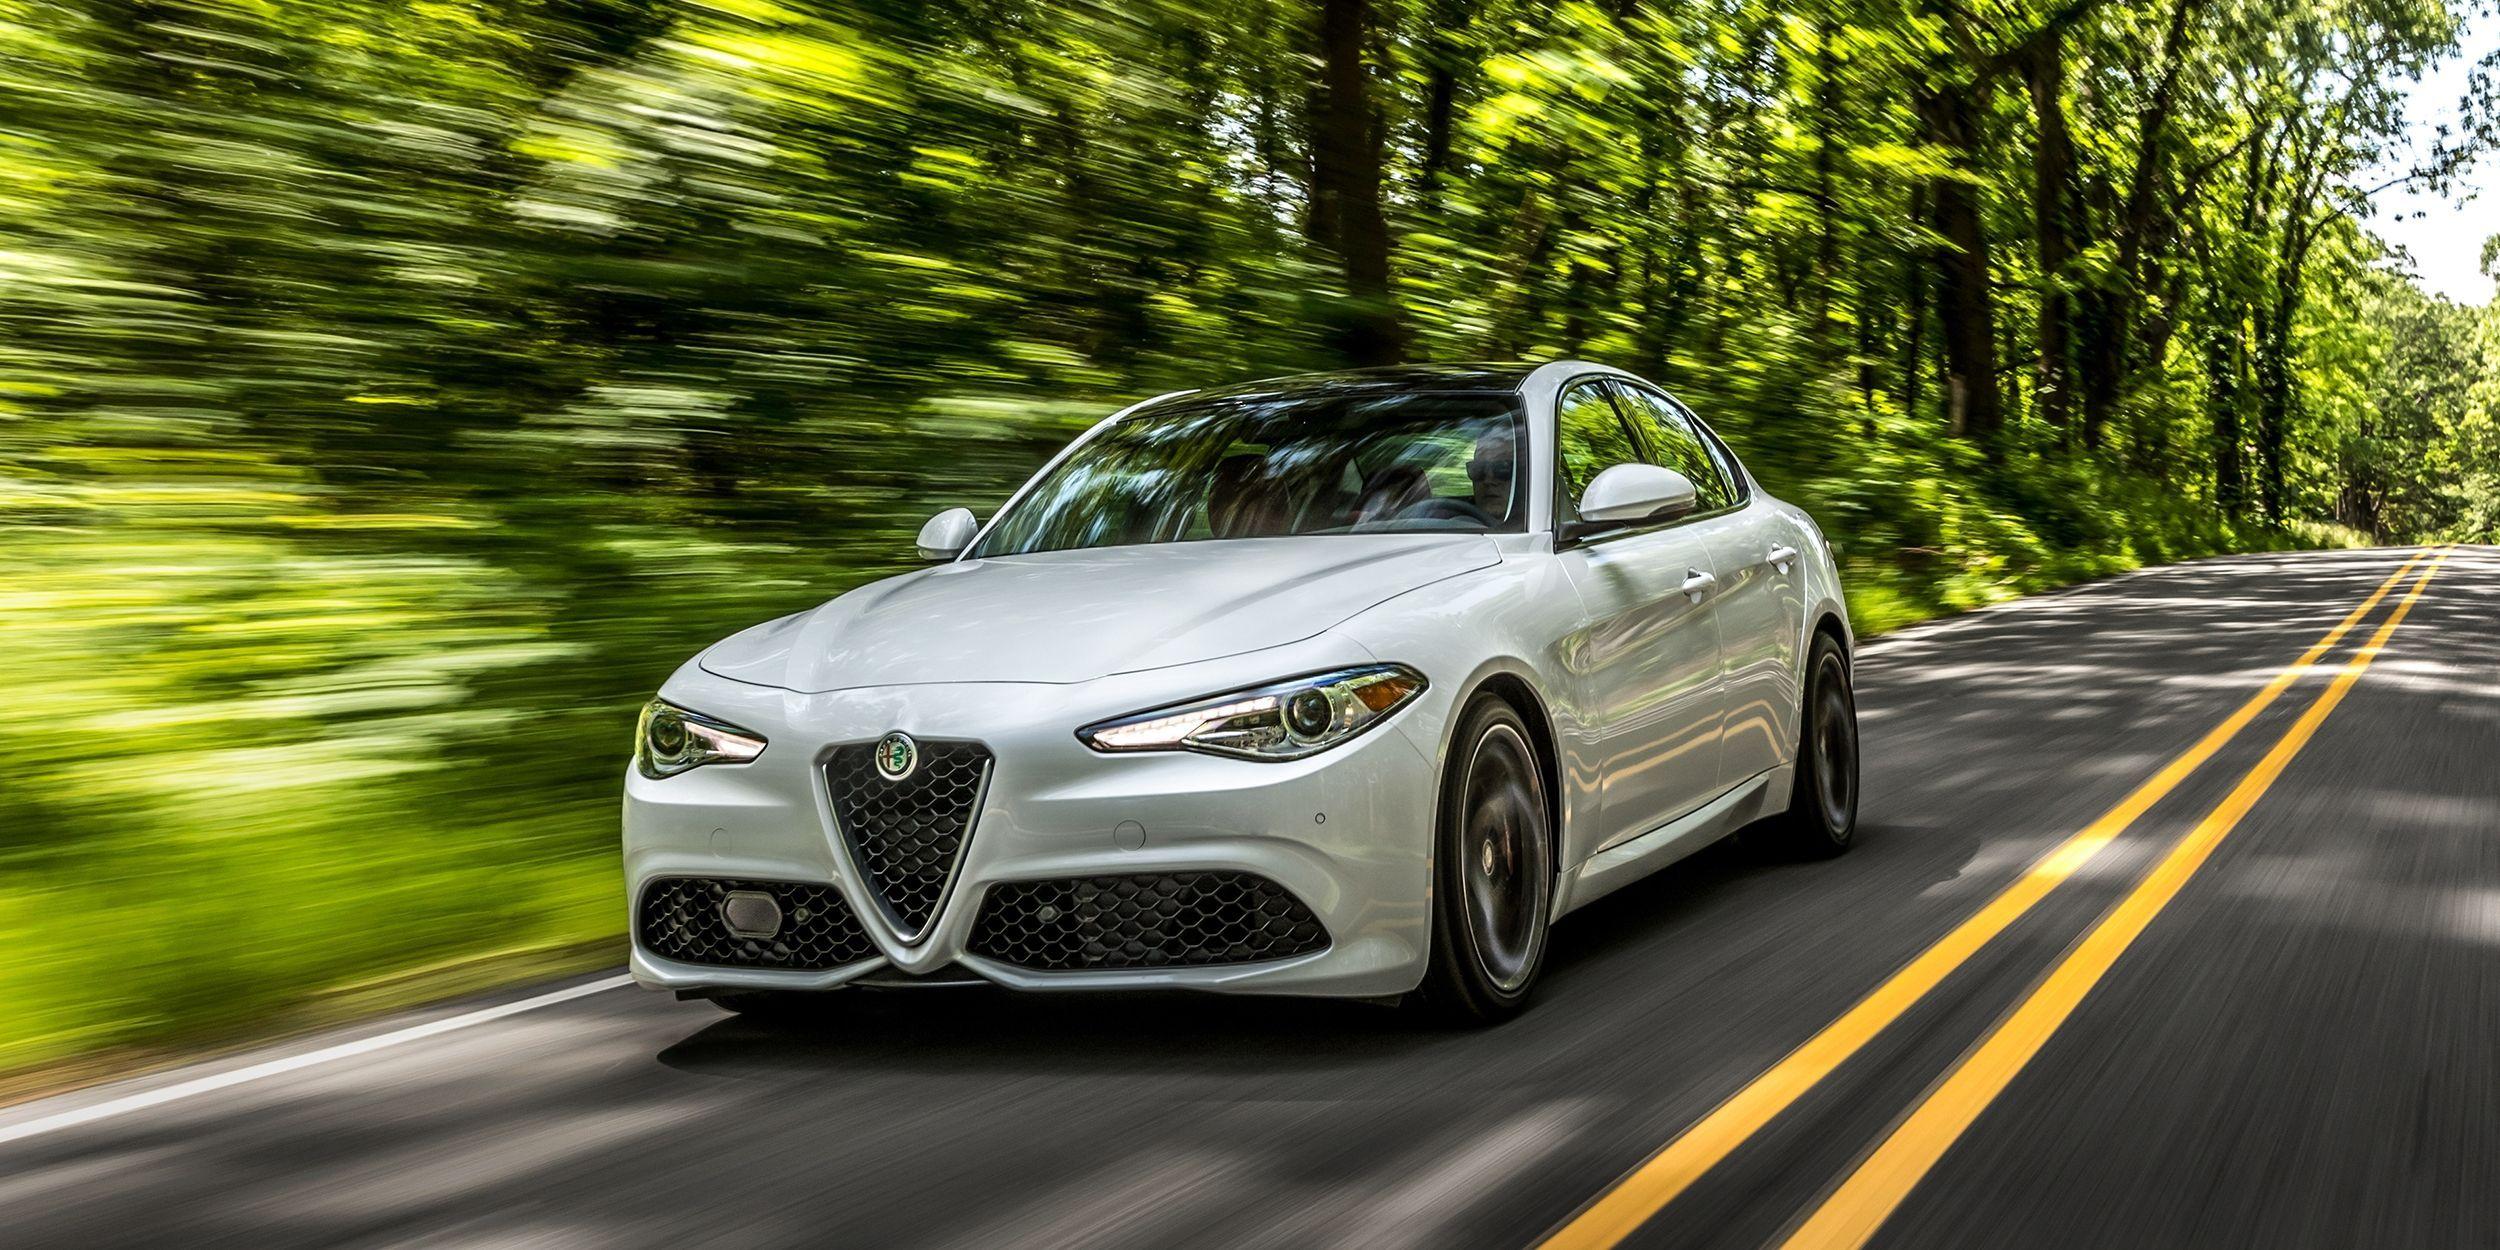 Alfa Romeo Giulia >> 2017 Alfa Romeo Giulia Ti Review First Drive Of New Giulia Sport Sedan